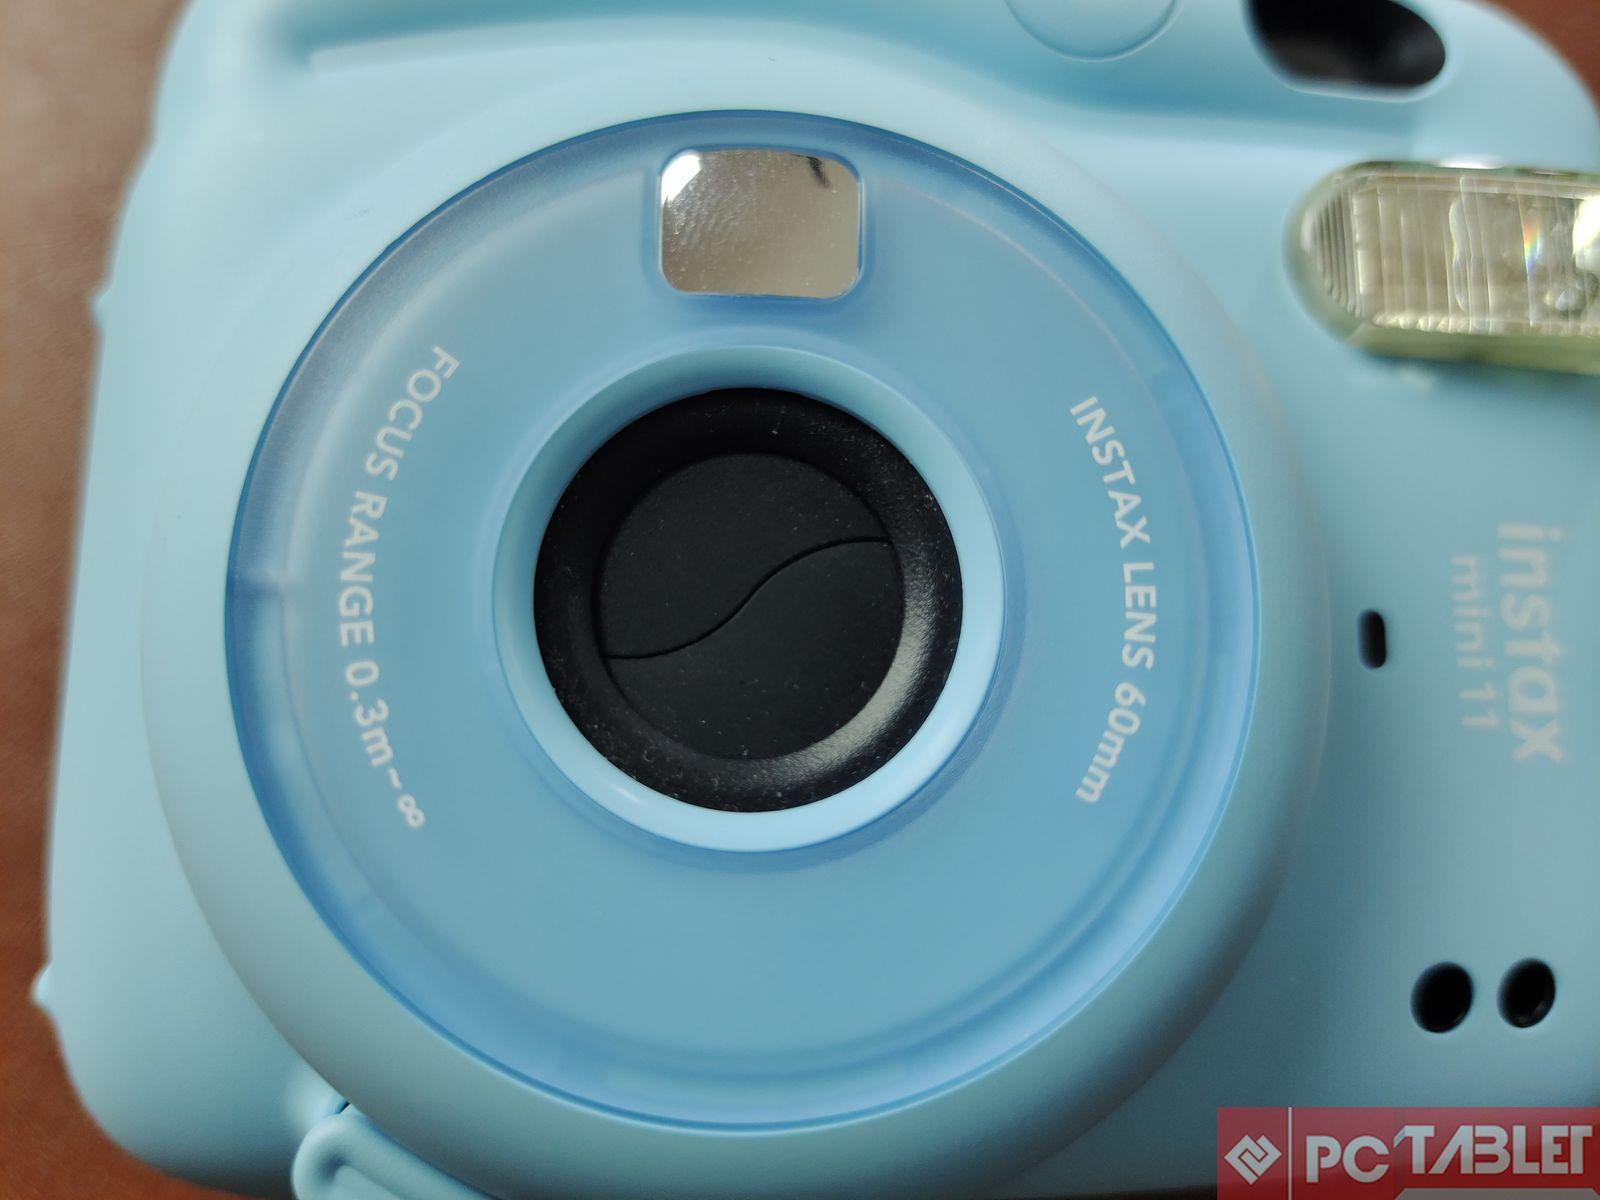 Fujifilm Instax Mini 11 Review 4